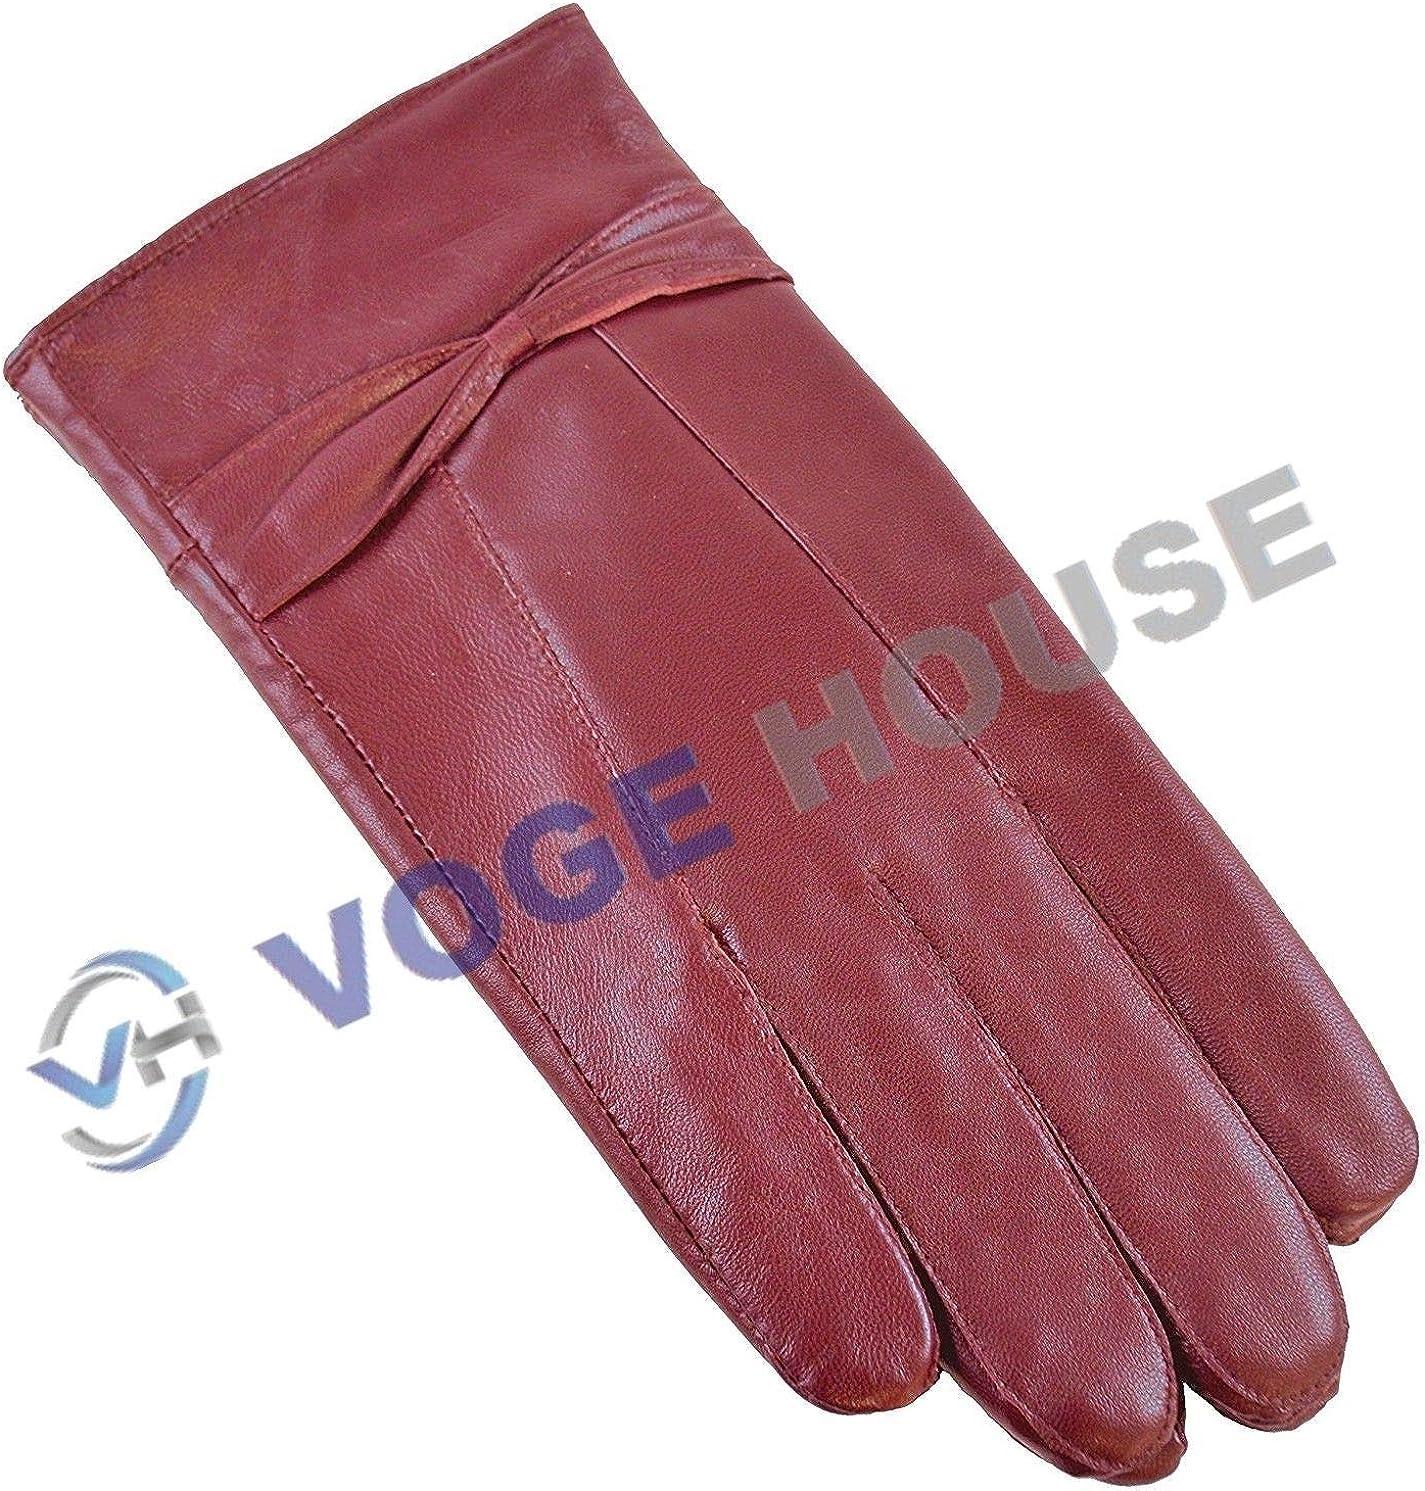 Ladies Soft Sheepskin 100% Leather Driving Gloves Warm Waterproof Bow Design(SM (Small & Medium) Burgundy)